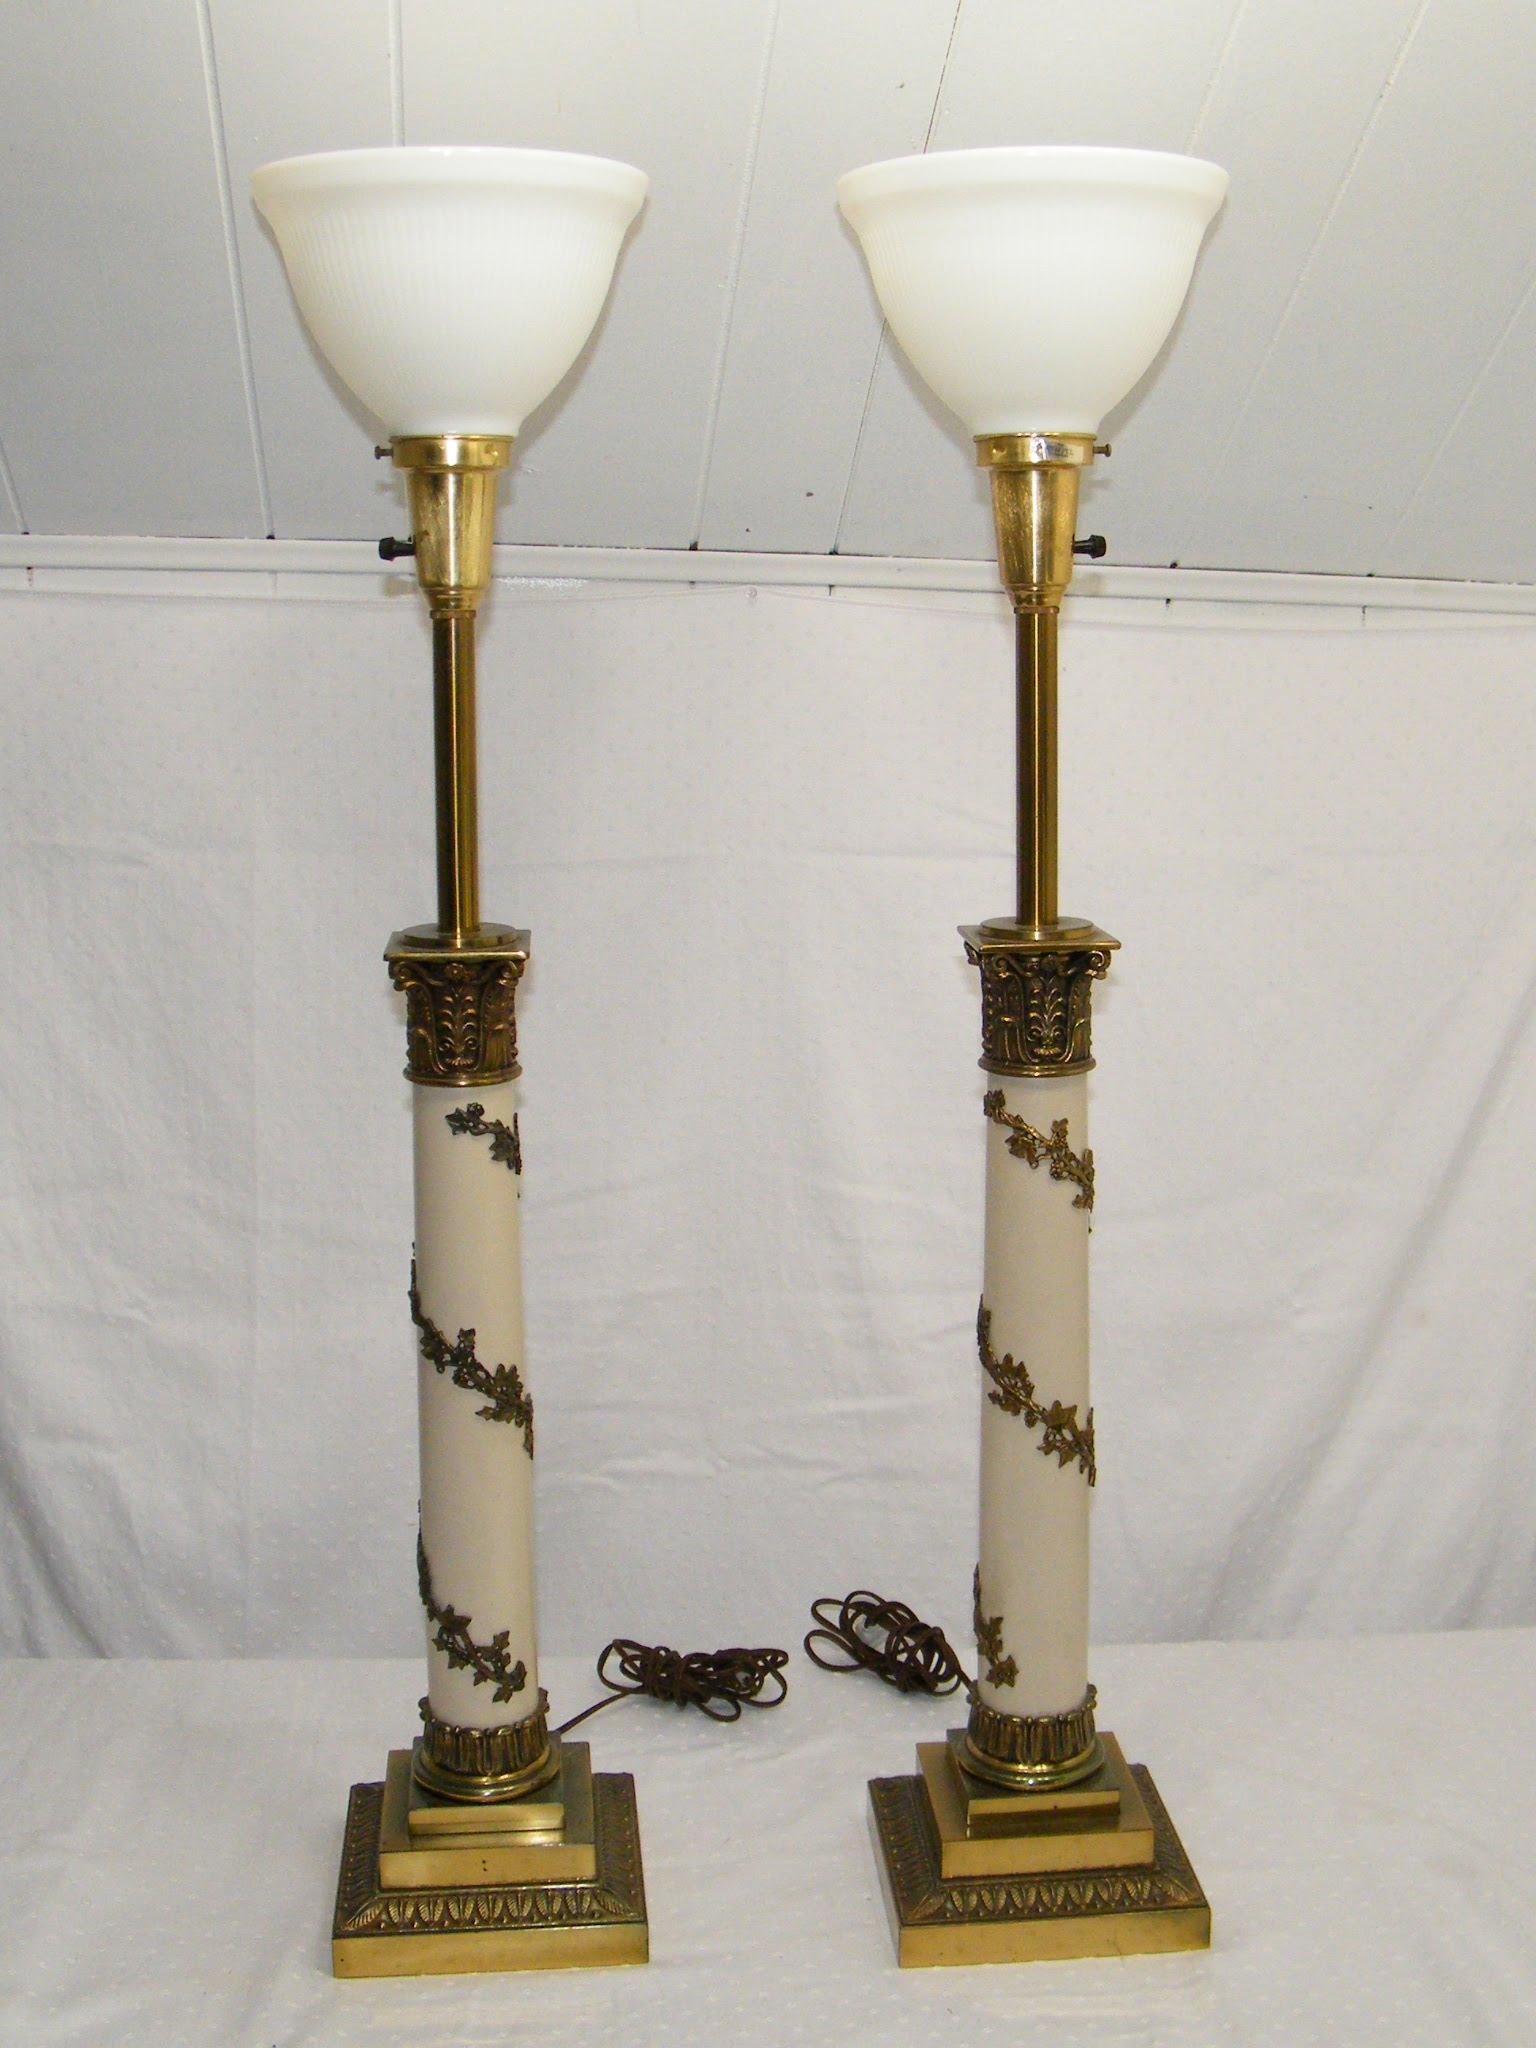 Vintage Stiffel Lamps >> Vintage Stiffel Lamps Unforeseen Beauty Every Home Needs Warisan